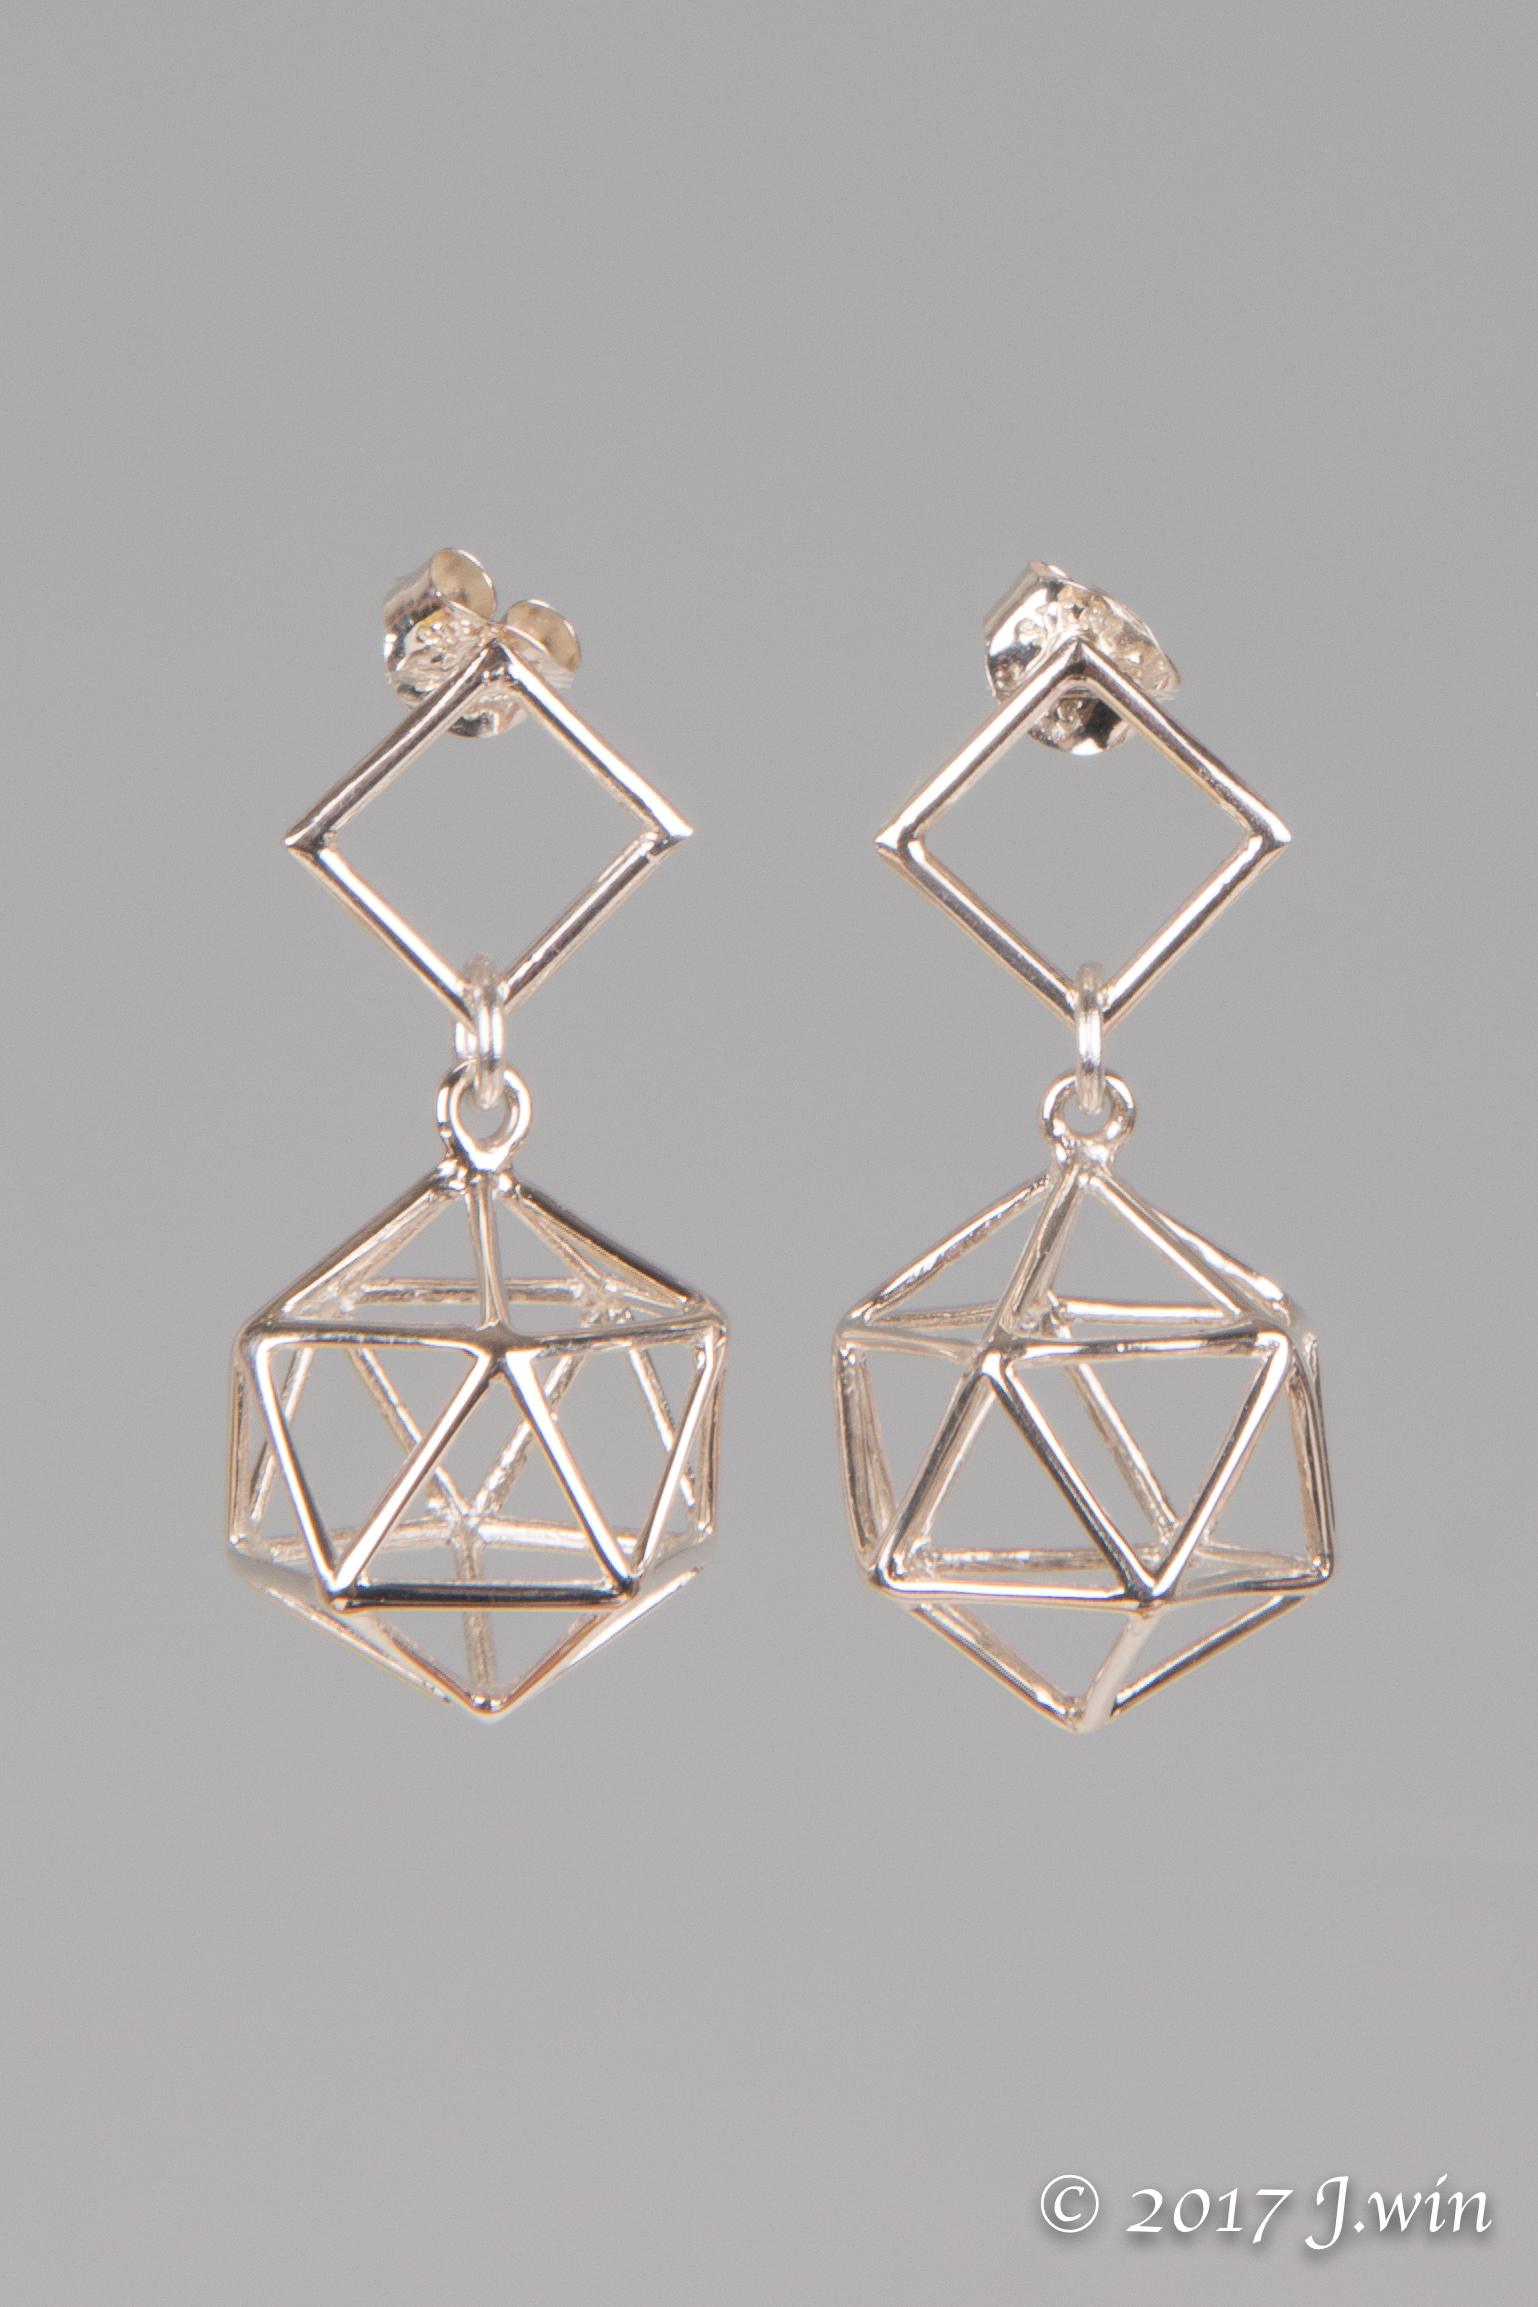 Geometric cage earrings